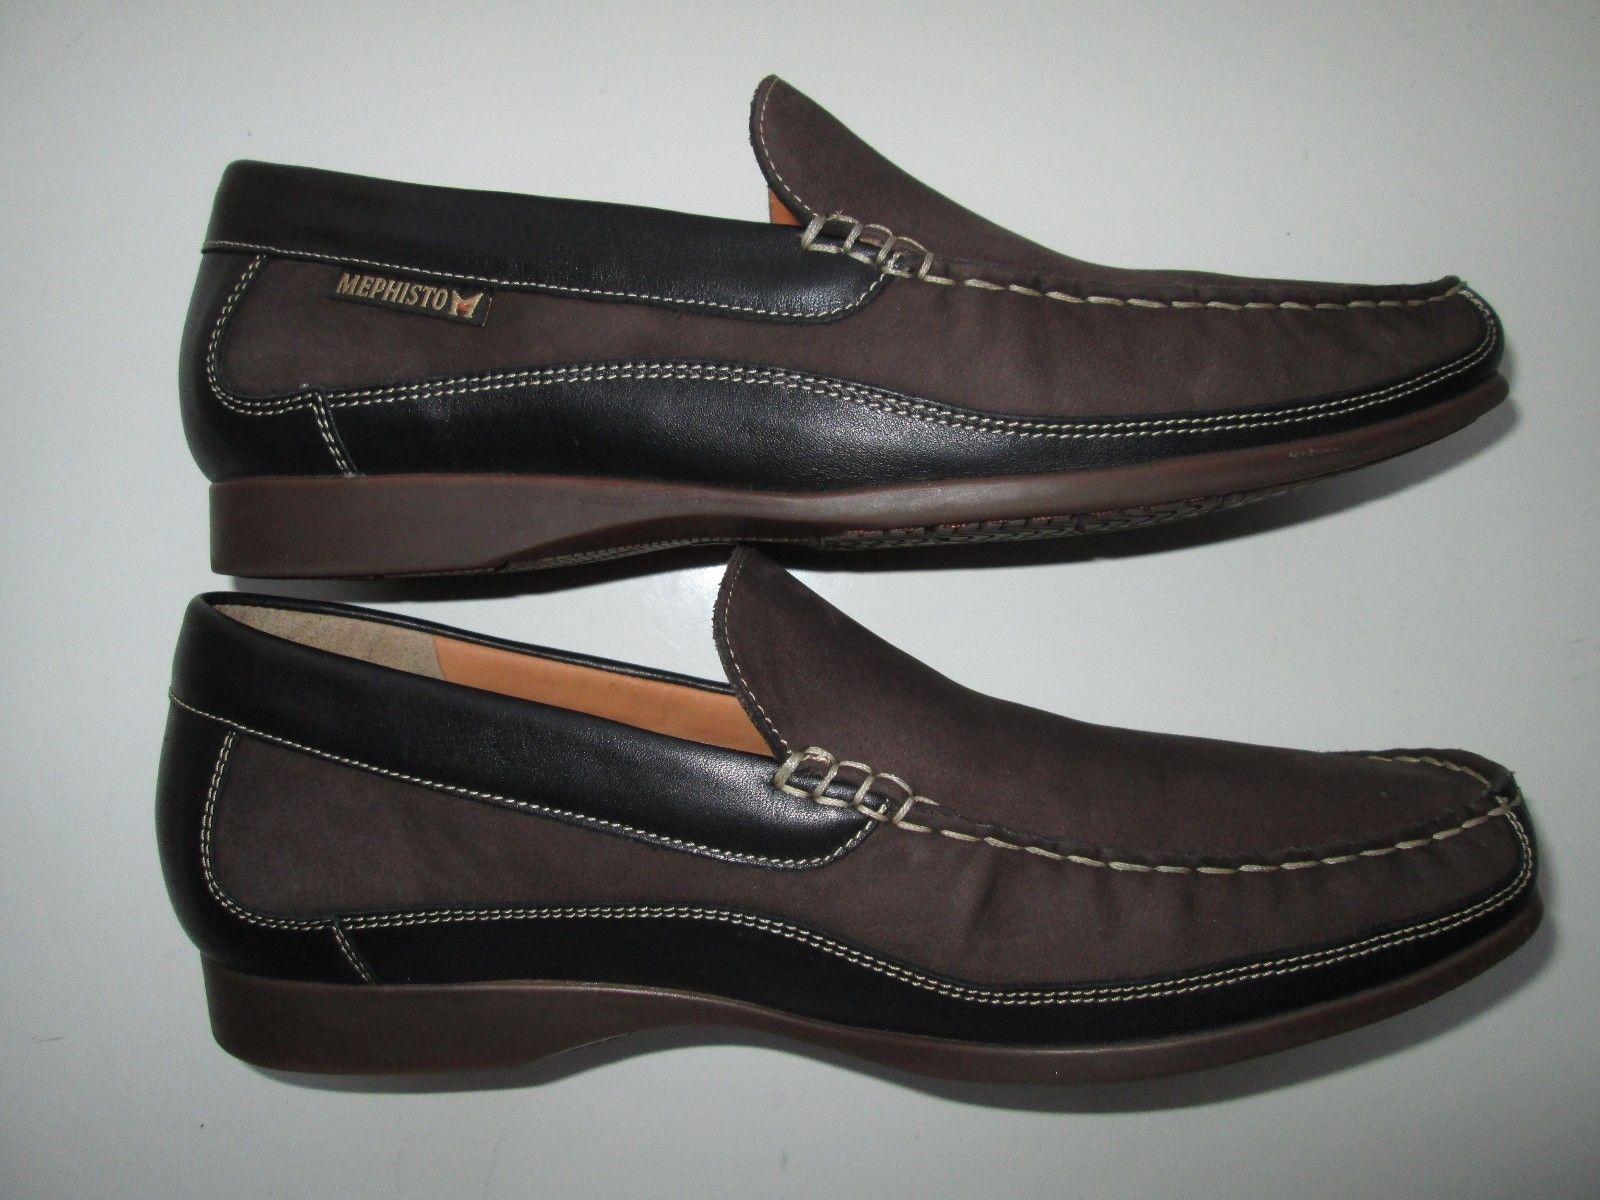 "3c54992444a Mephisto 715081414956 Baduard Slip-On Men Loafer Shoes Brown 9.5E (10.5""  feet"